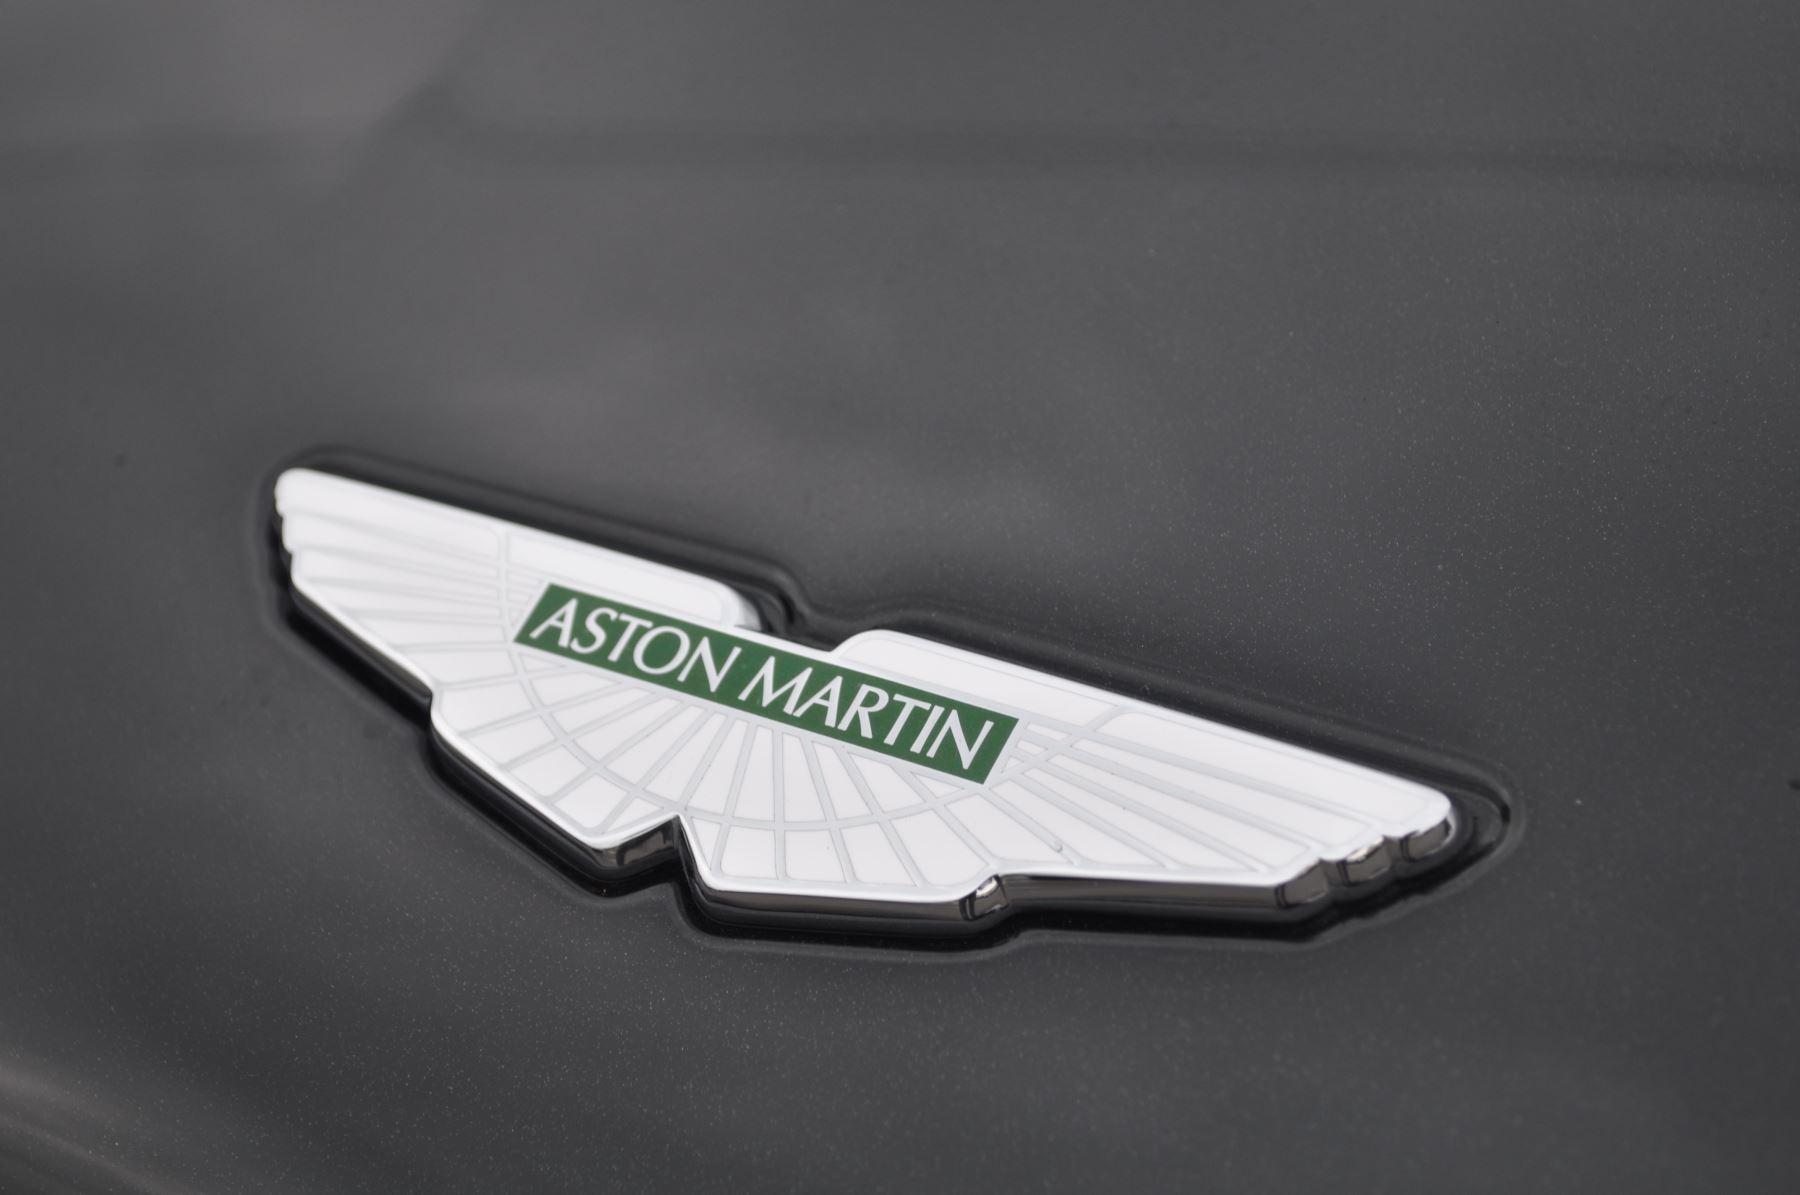 Aston Martin DB11 V12 AMR Touchtronic image 7